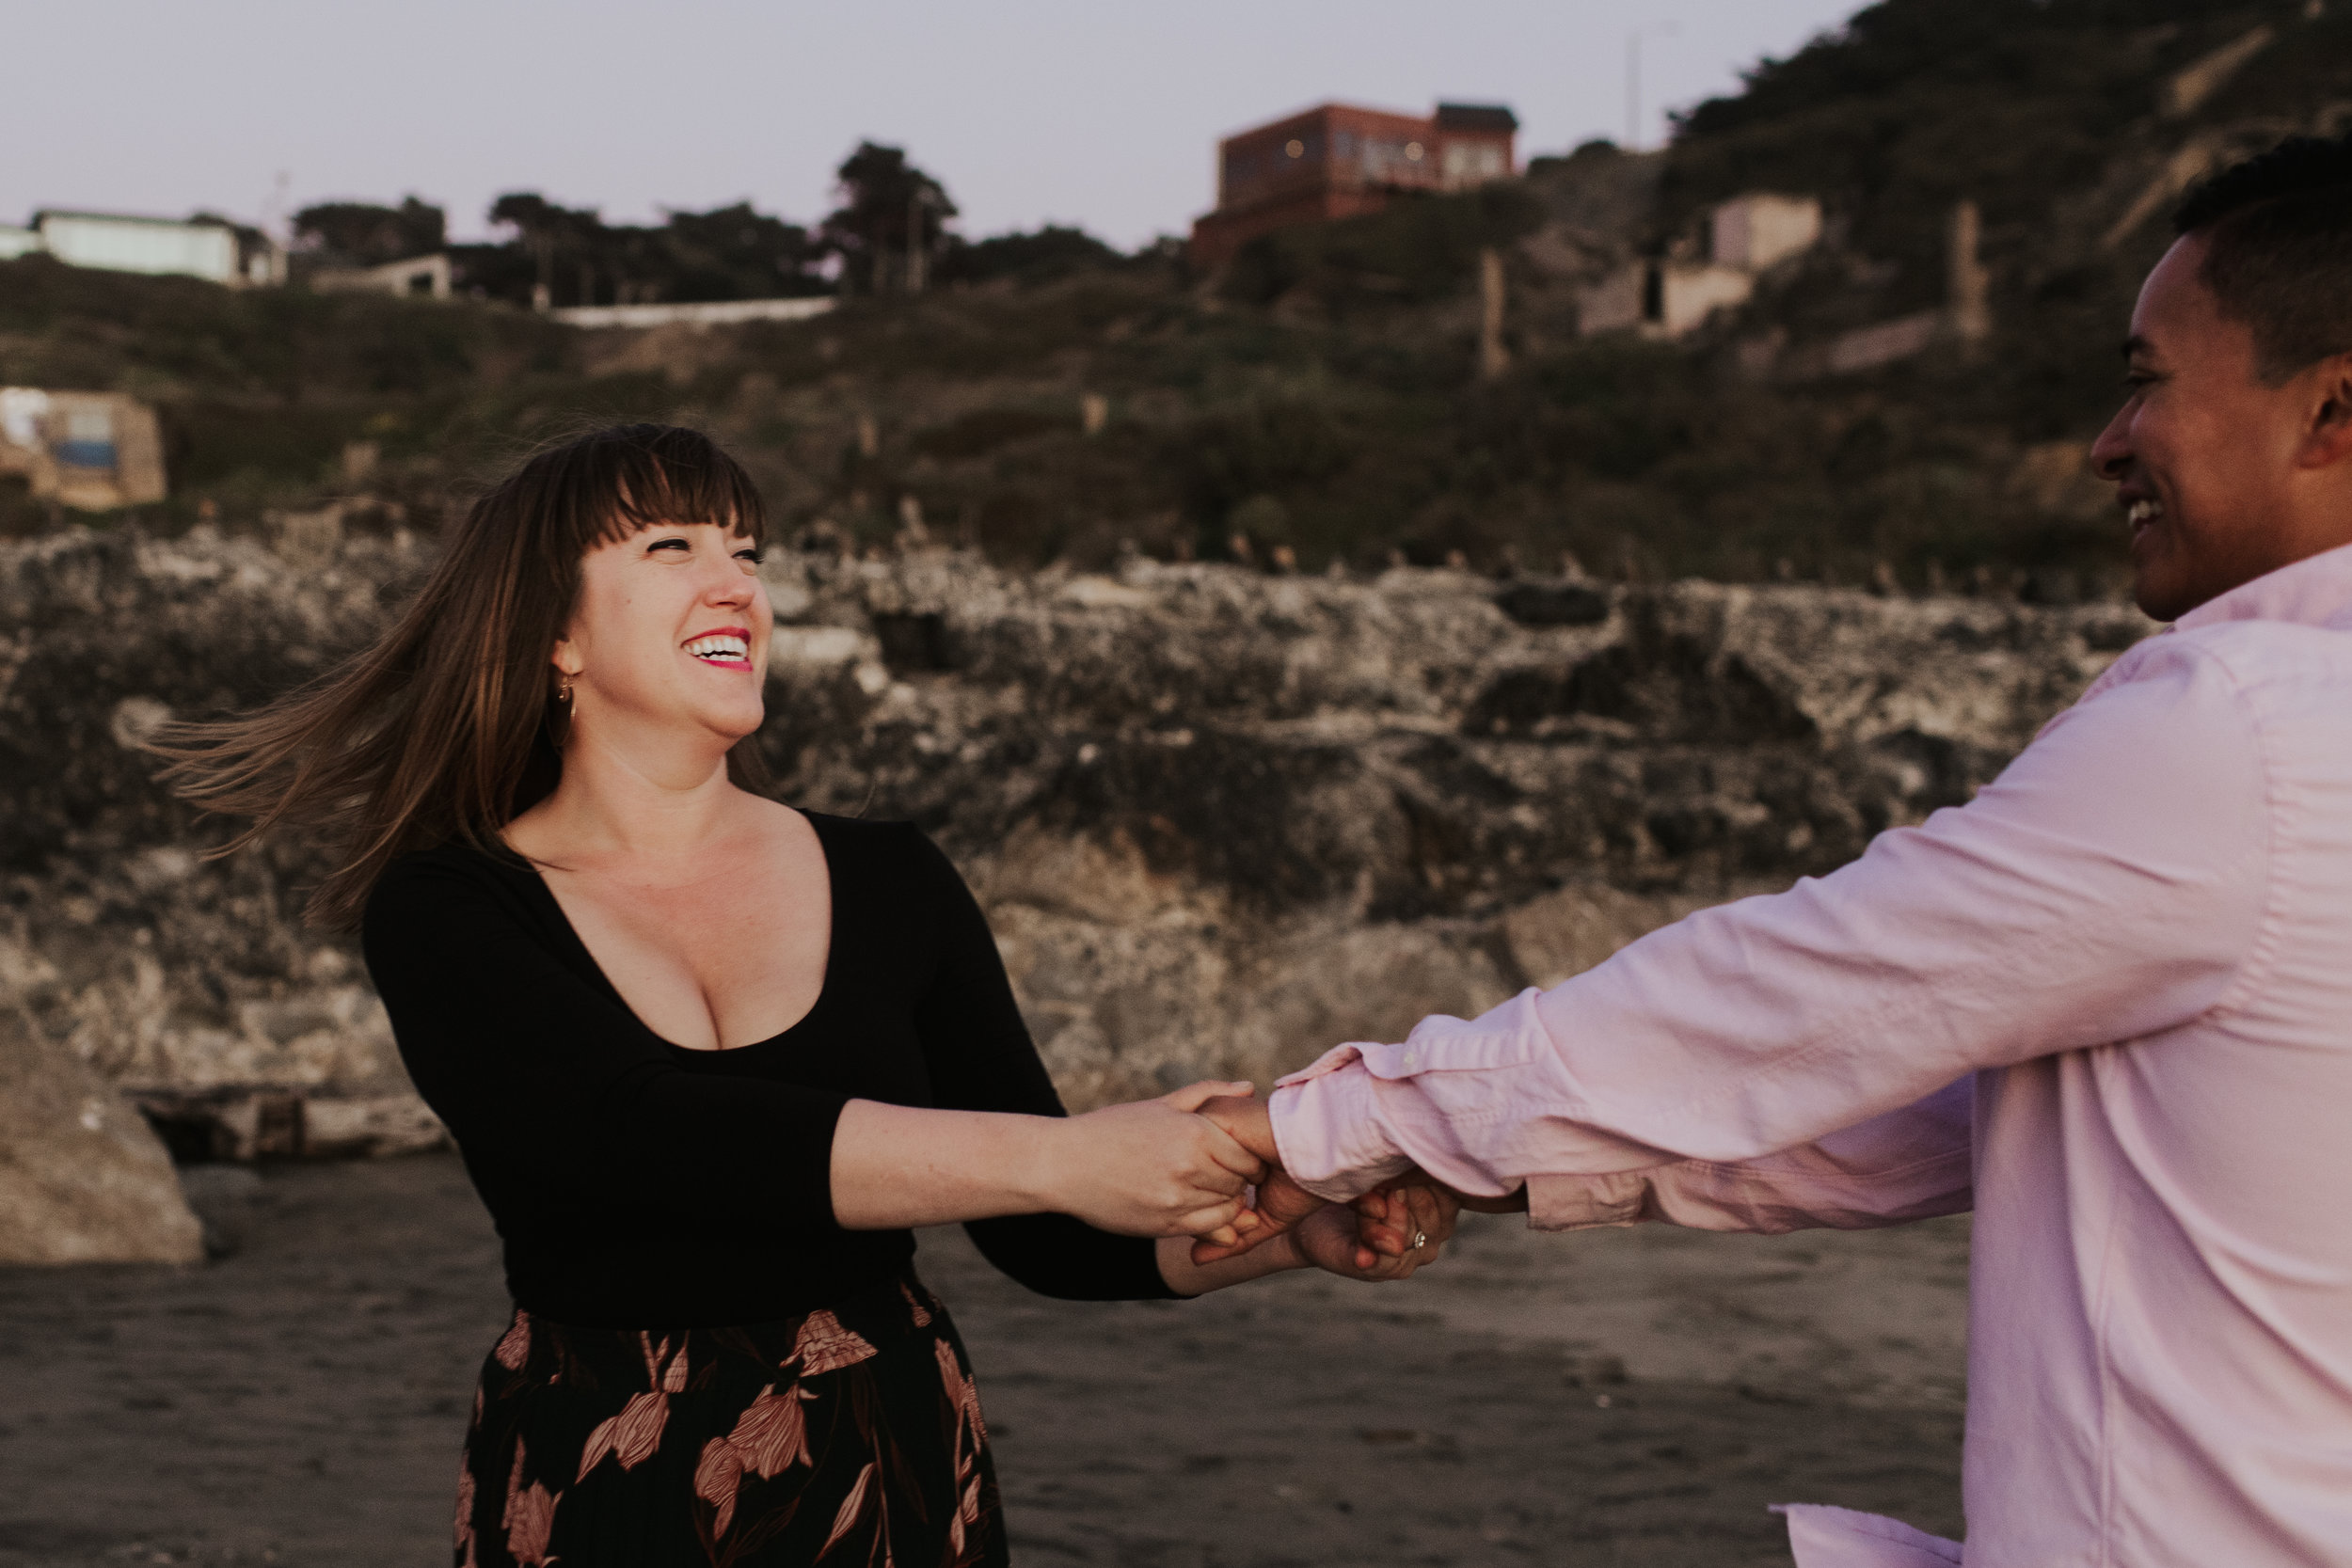 Erin-Rene-Kramer-Finished-San-Francisco-Redwoods-Legion-of-Honor-Sutro-Baths-Engagement-Session-with-Dog-122.jpg